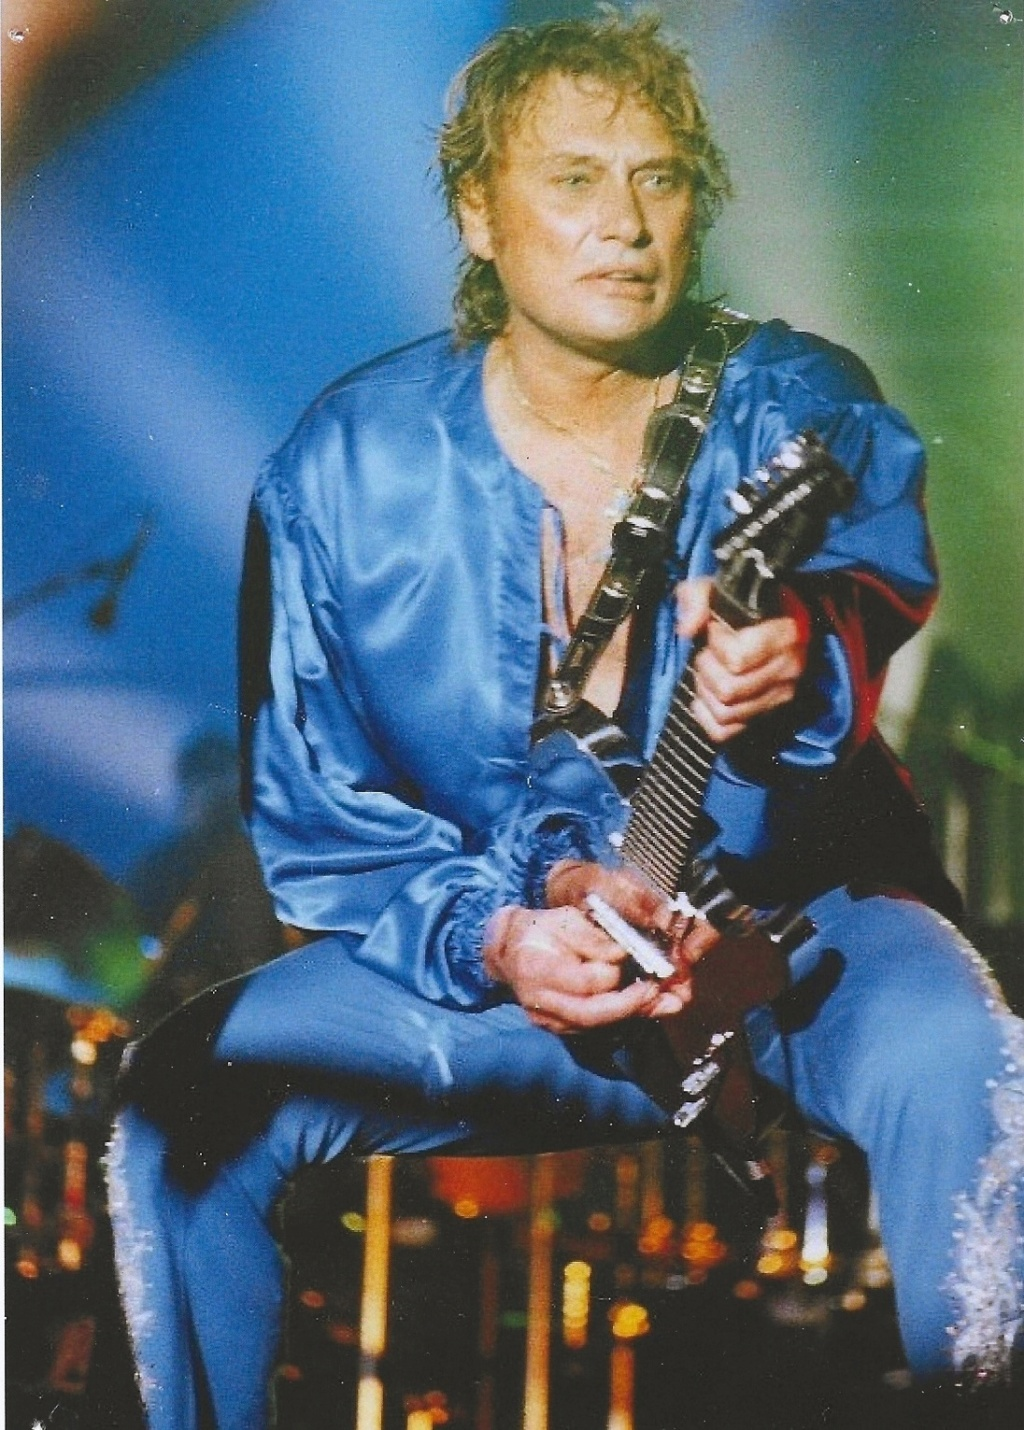 LES PHOTOS DE CANAILLES2 - Page 4 Guitar12